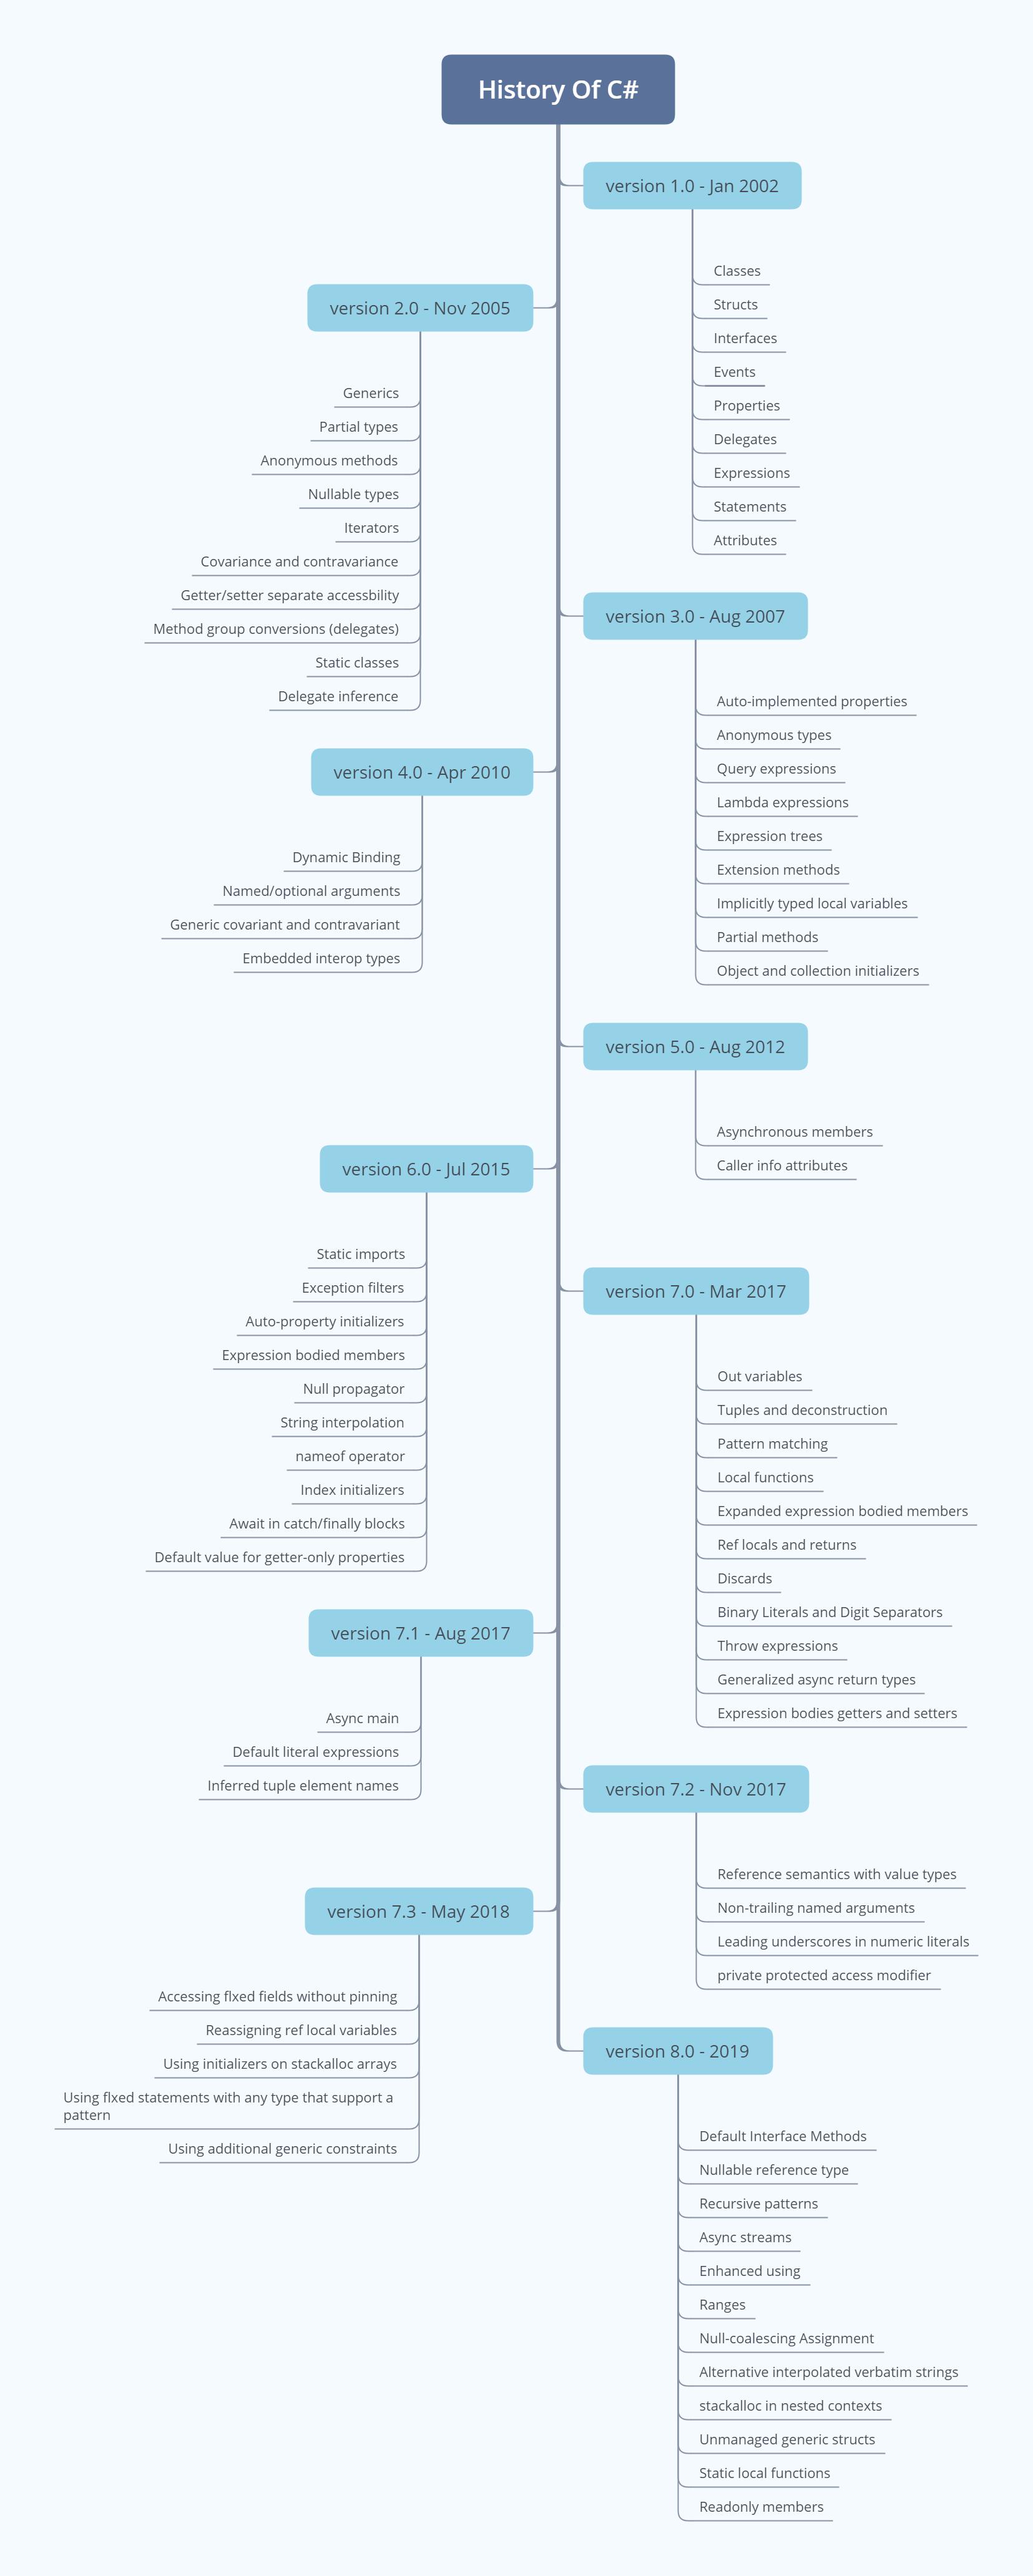 History Of C# Versions